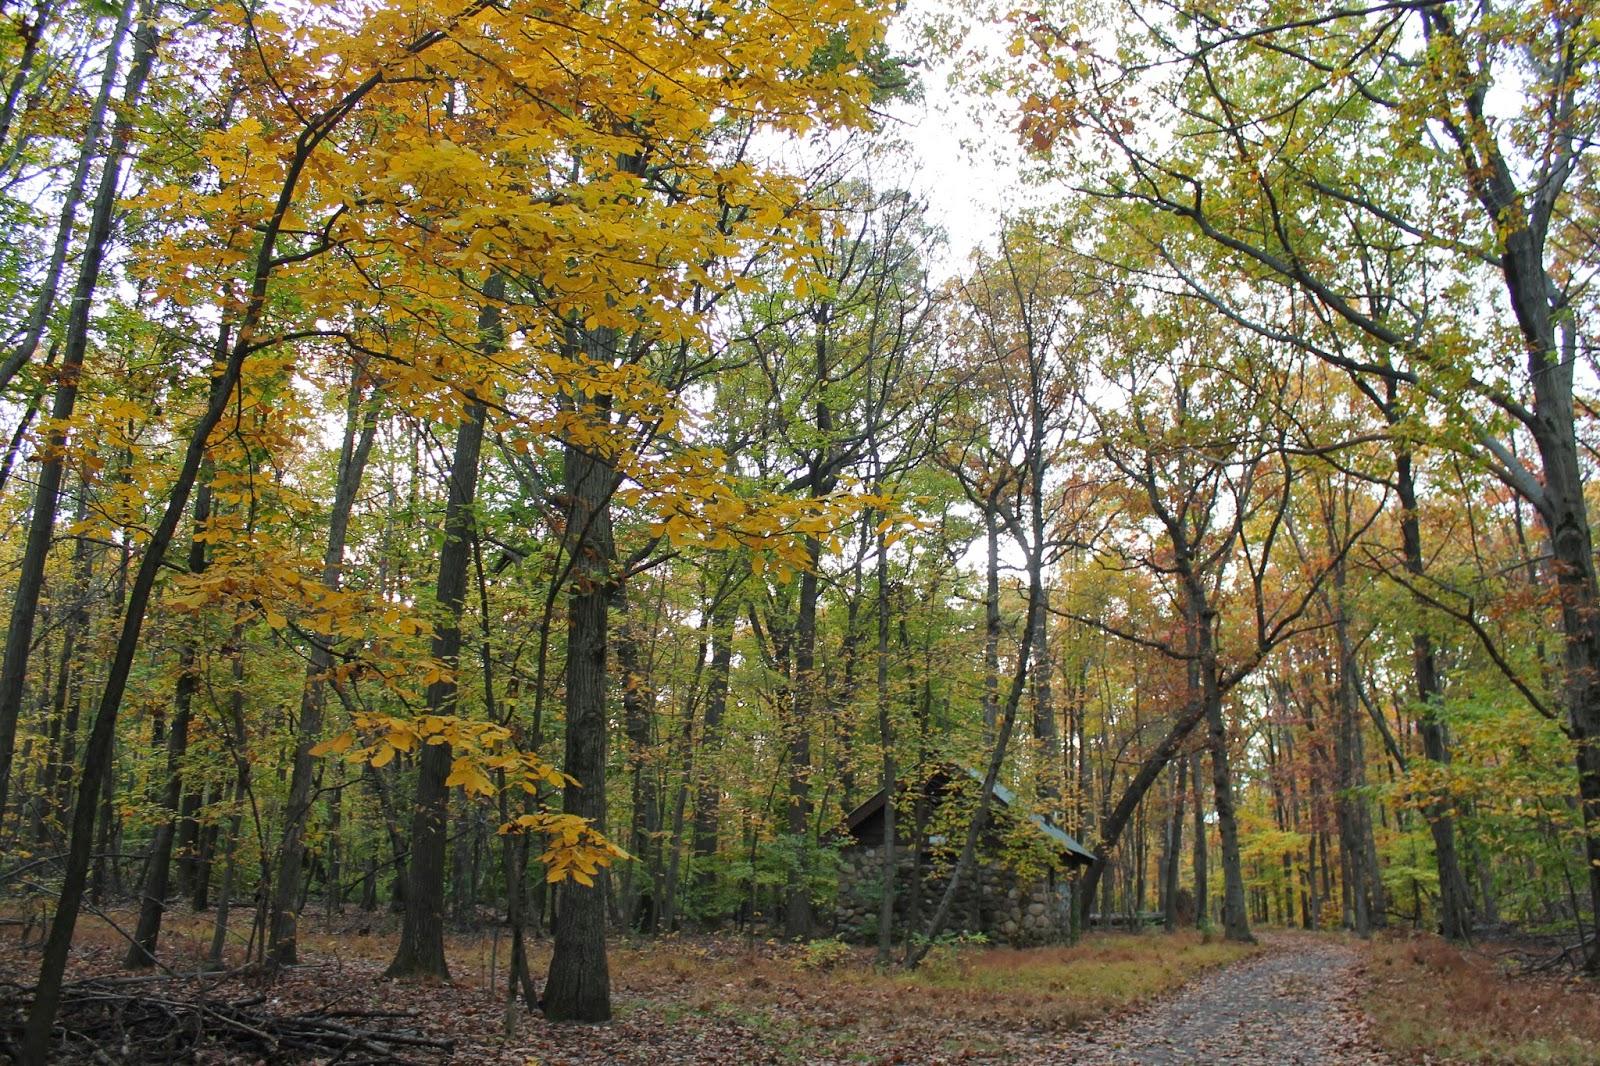 In Between Life Fall Nature Walks